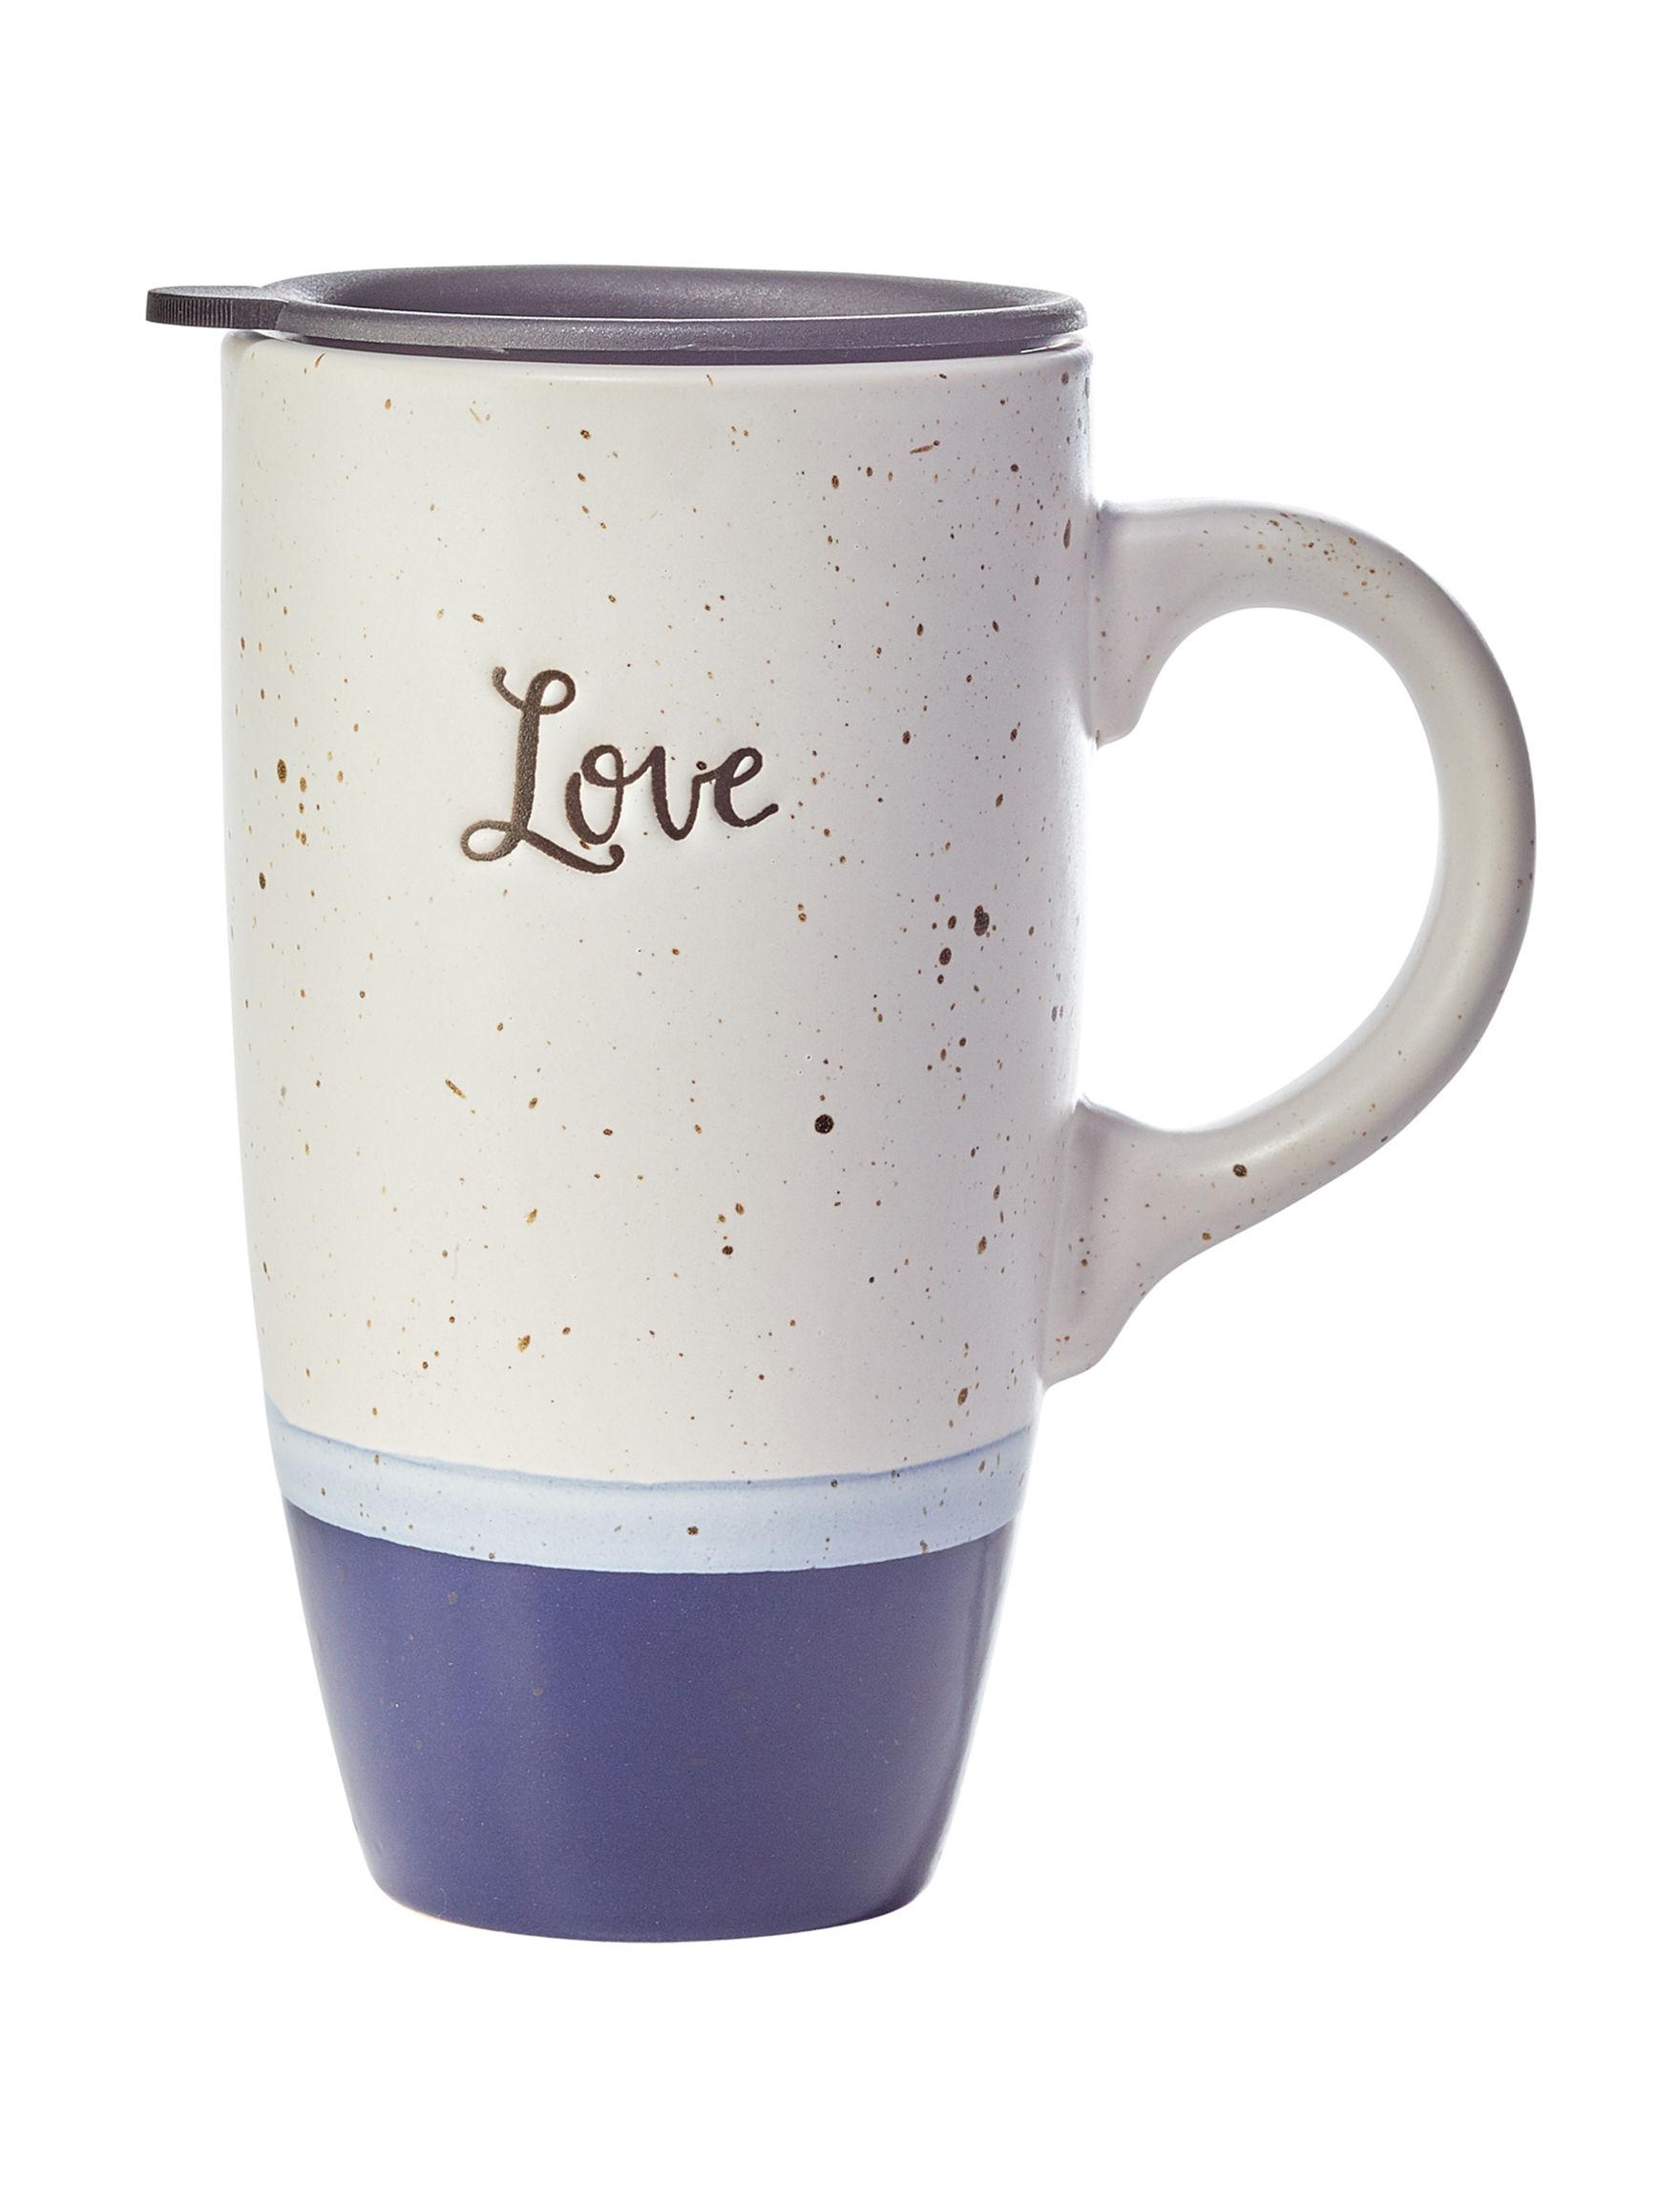 Enchante White / Black Mugs Drinkware